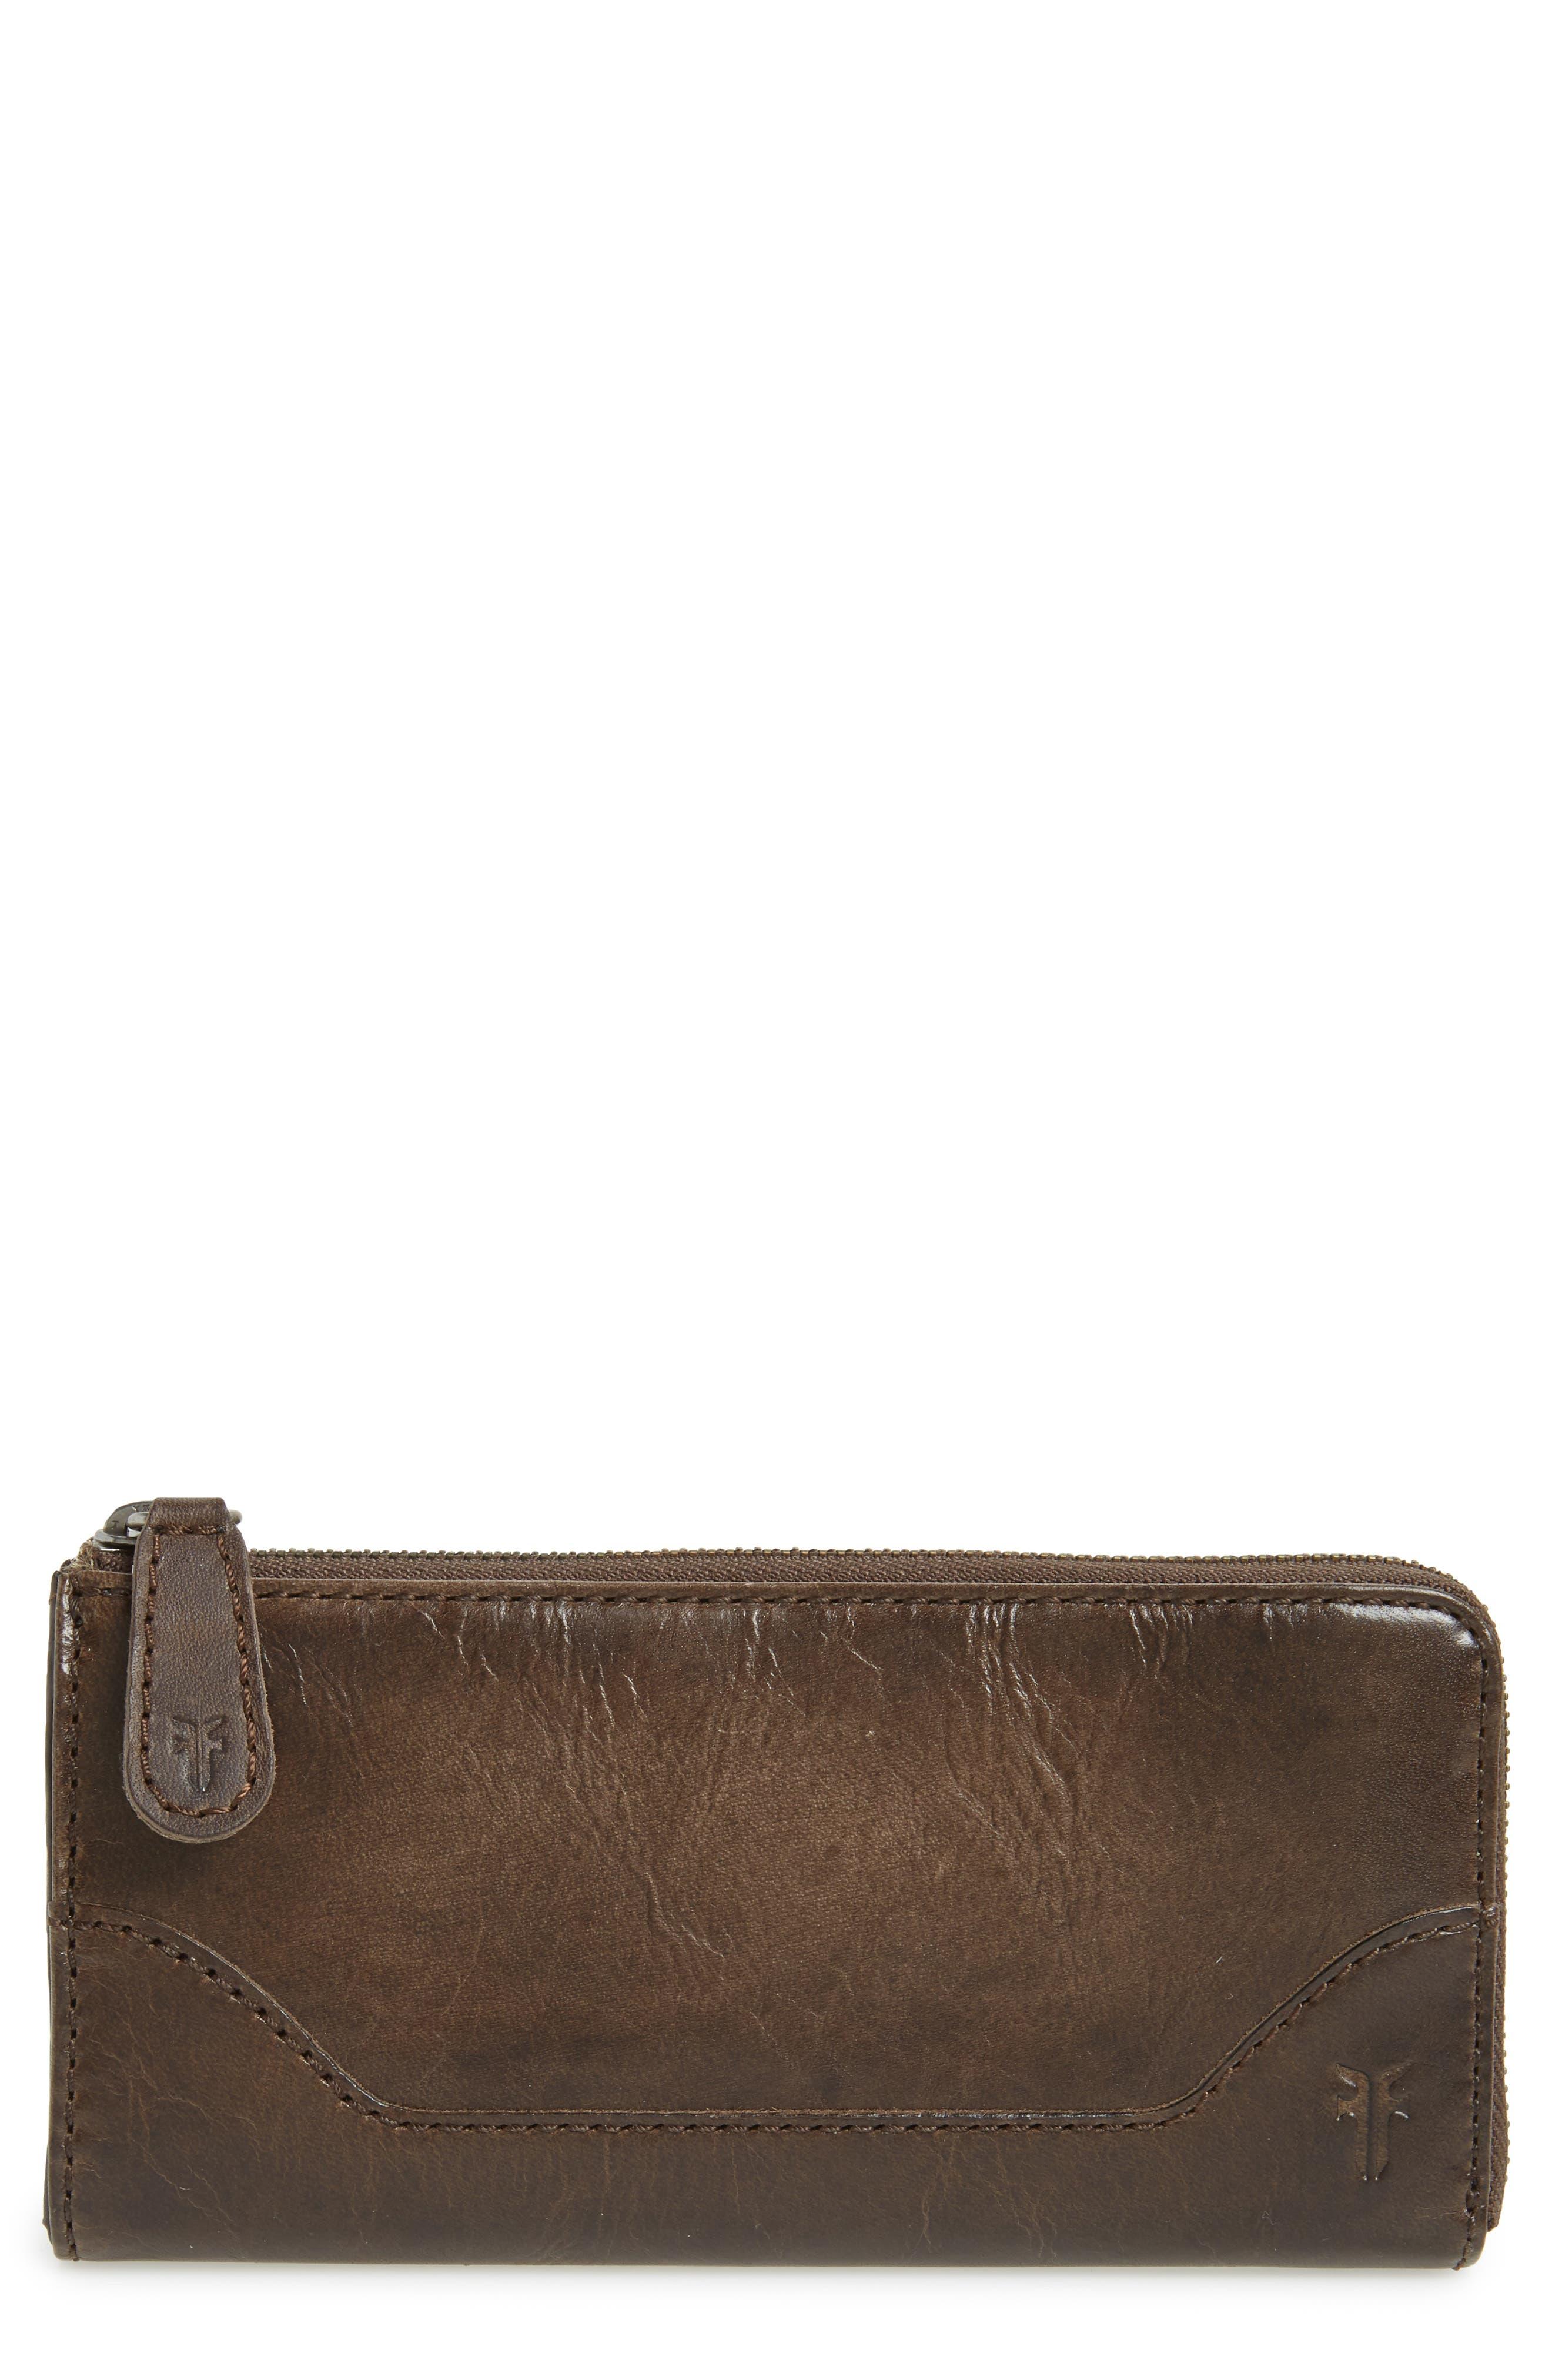 Alternate Image 1 Selected - Frye Melissa Leather Wallet